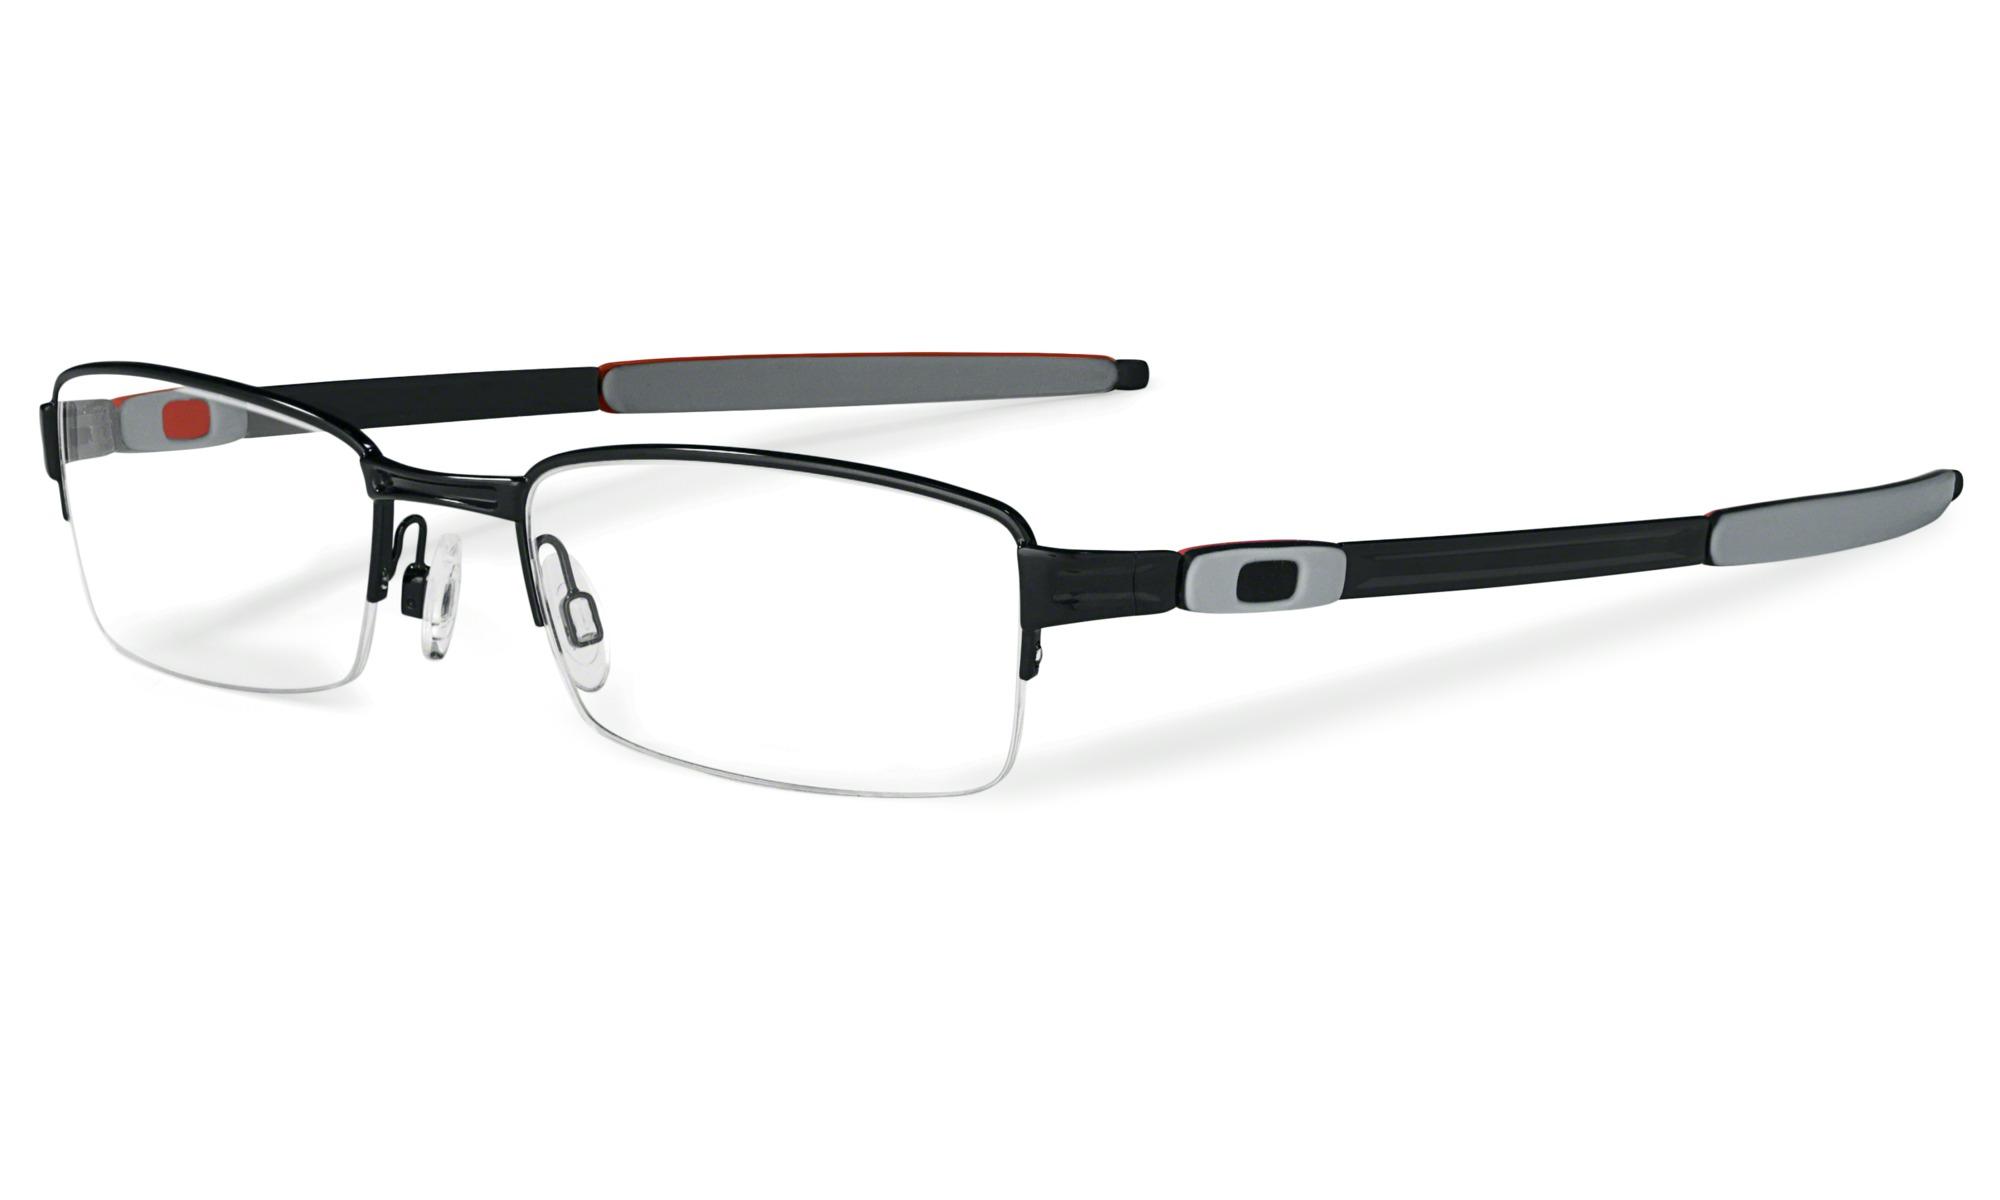 ef2017b0079b Oakley Tumbleweed Progressive Rx Eyeglasses